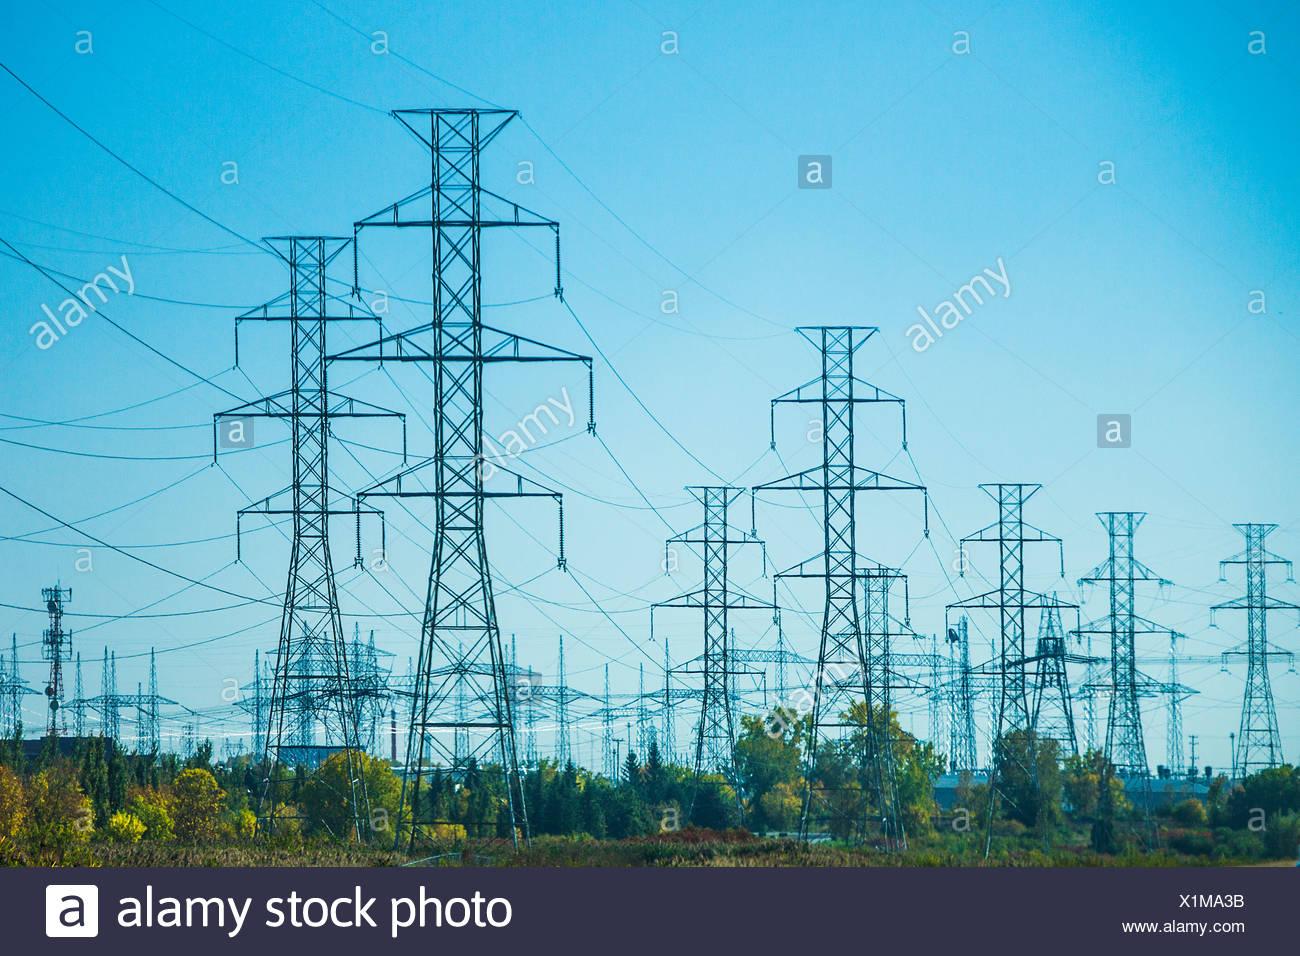 Kanada, Nordamerika, Quebec, Strom, Energie, High, Industrie, Industrie, macht, Türme, Spannung Stockbild